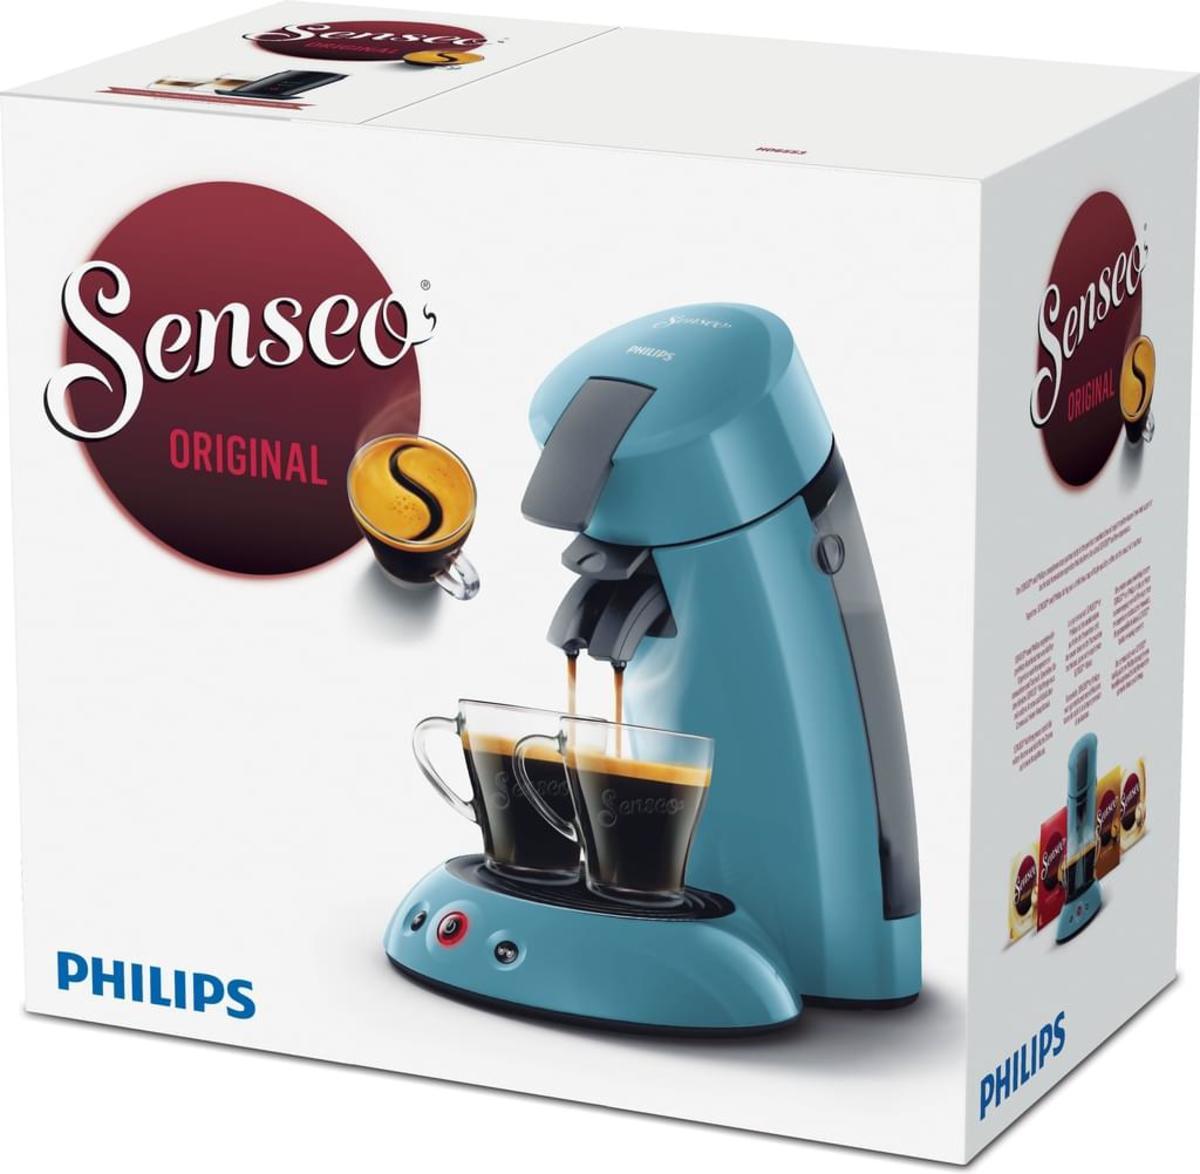 Bild 4 von Philips Senseo Kaffeepadmaschine HD 6553/XX Original, Farbe Petrol